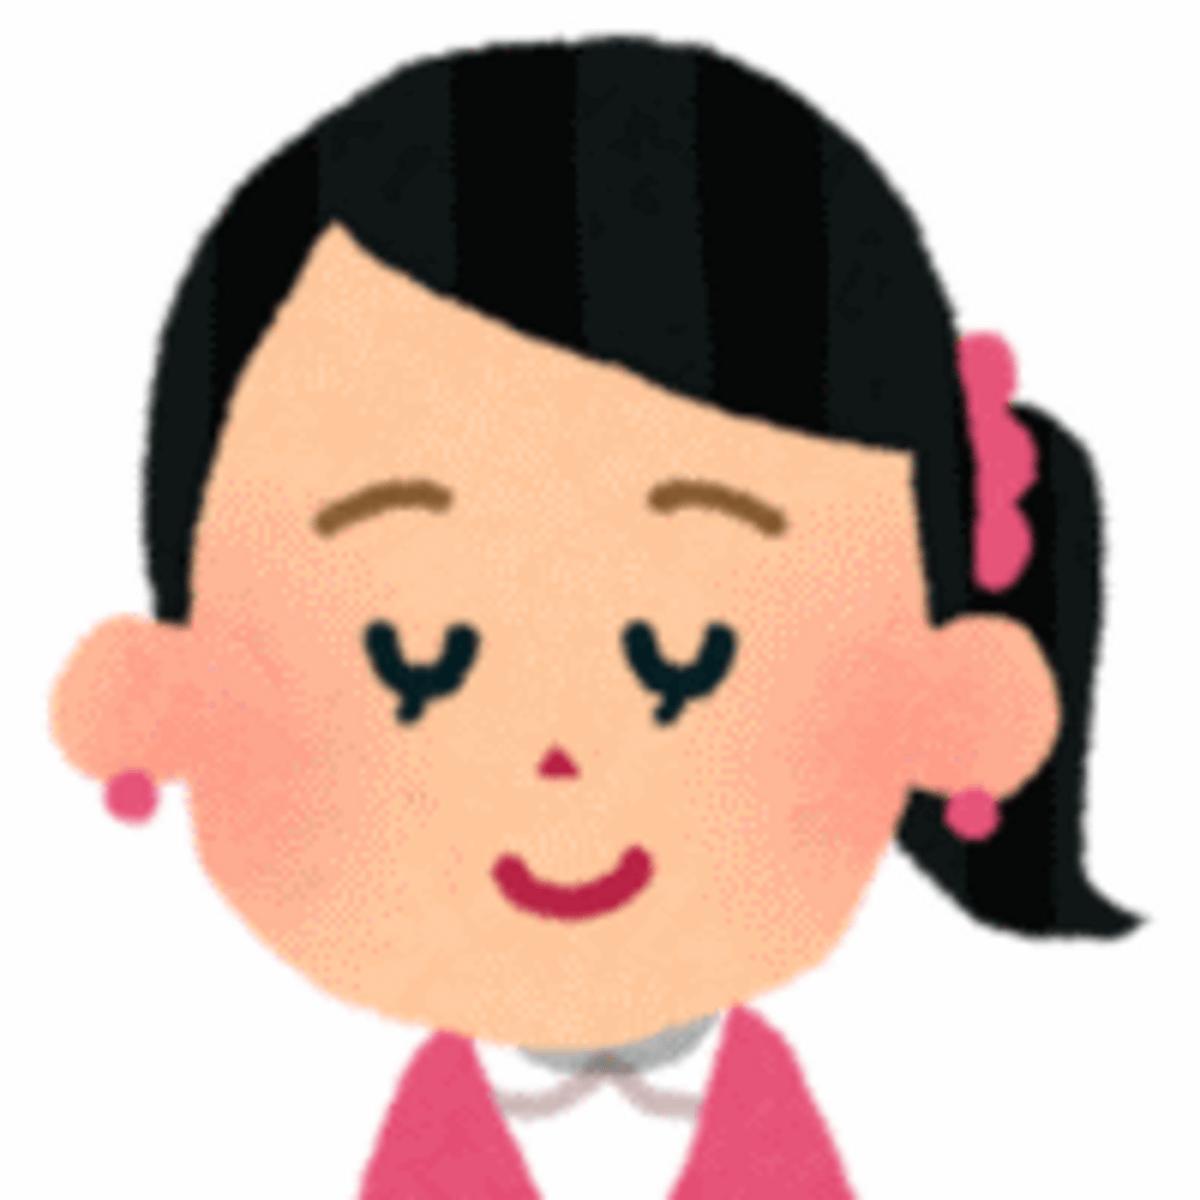 Eさん:大阪府20代女性のイラスト